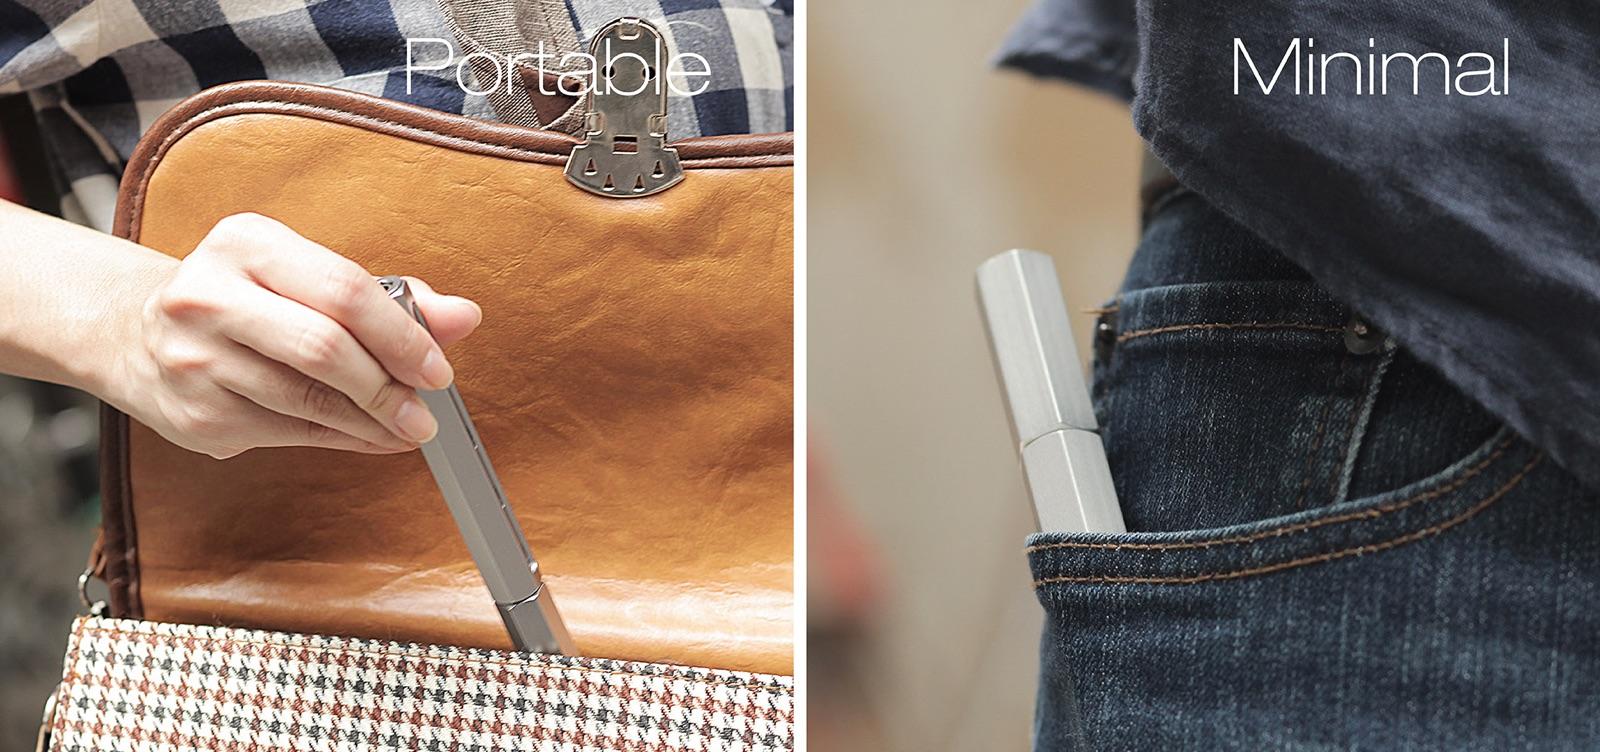 Mininch Tool Pen